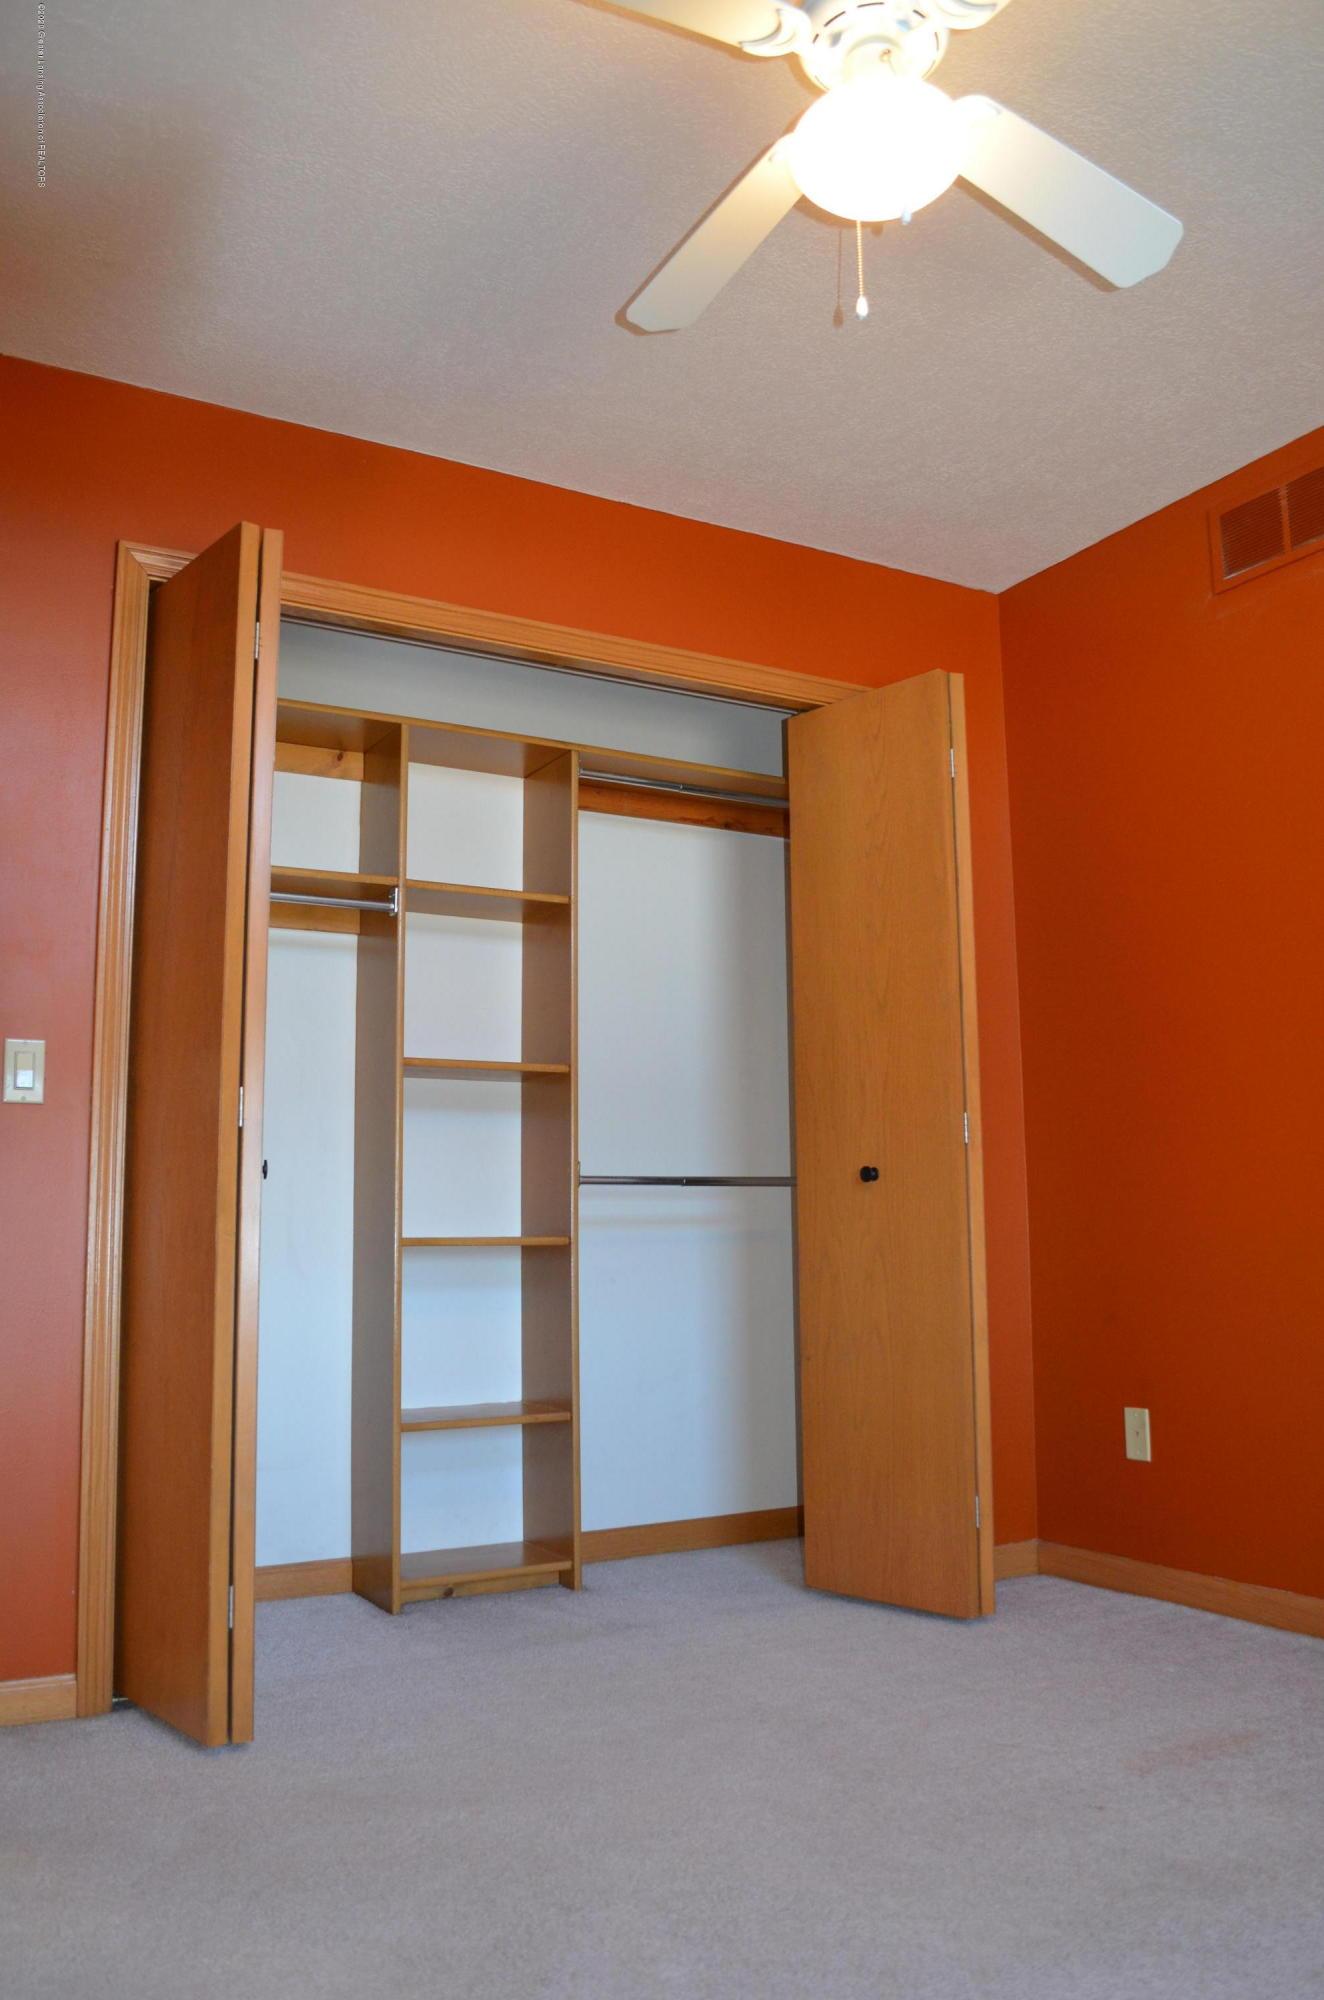 2349 Barnsbury Rd - Built in Closet Organizer - 23